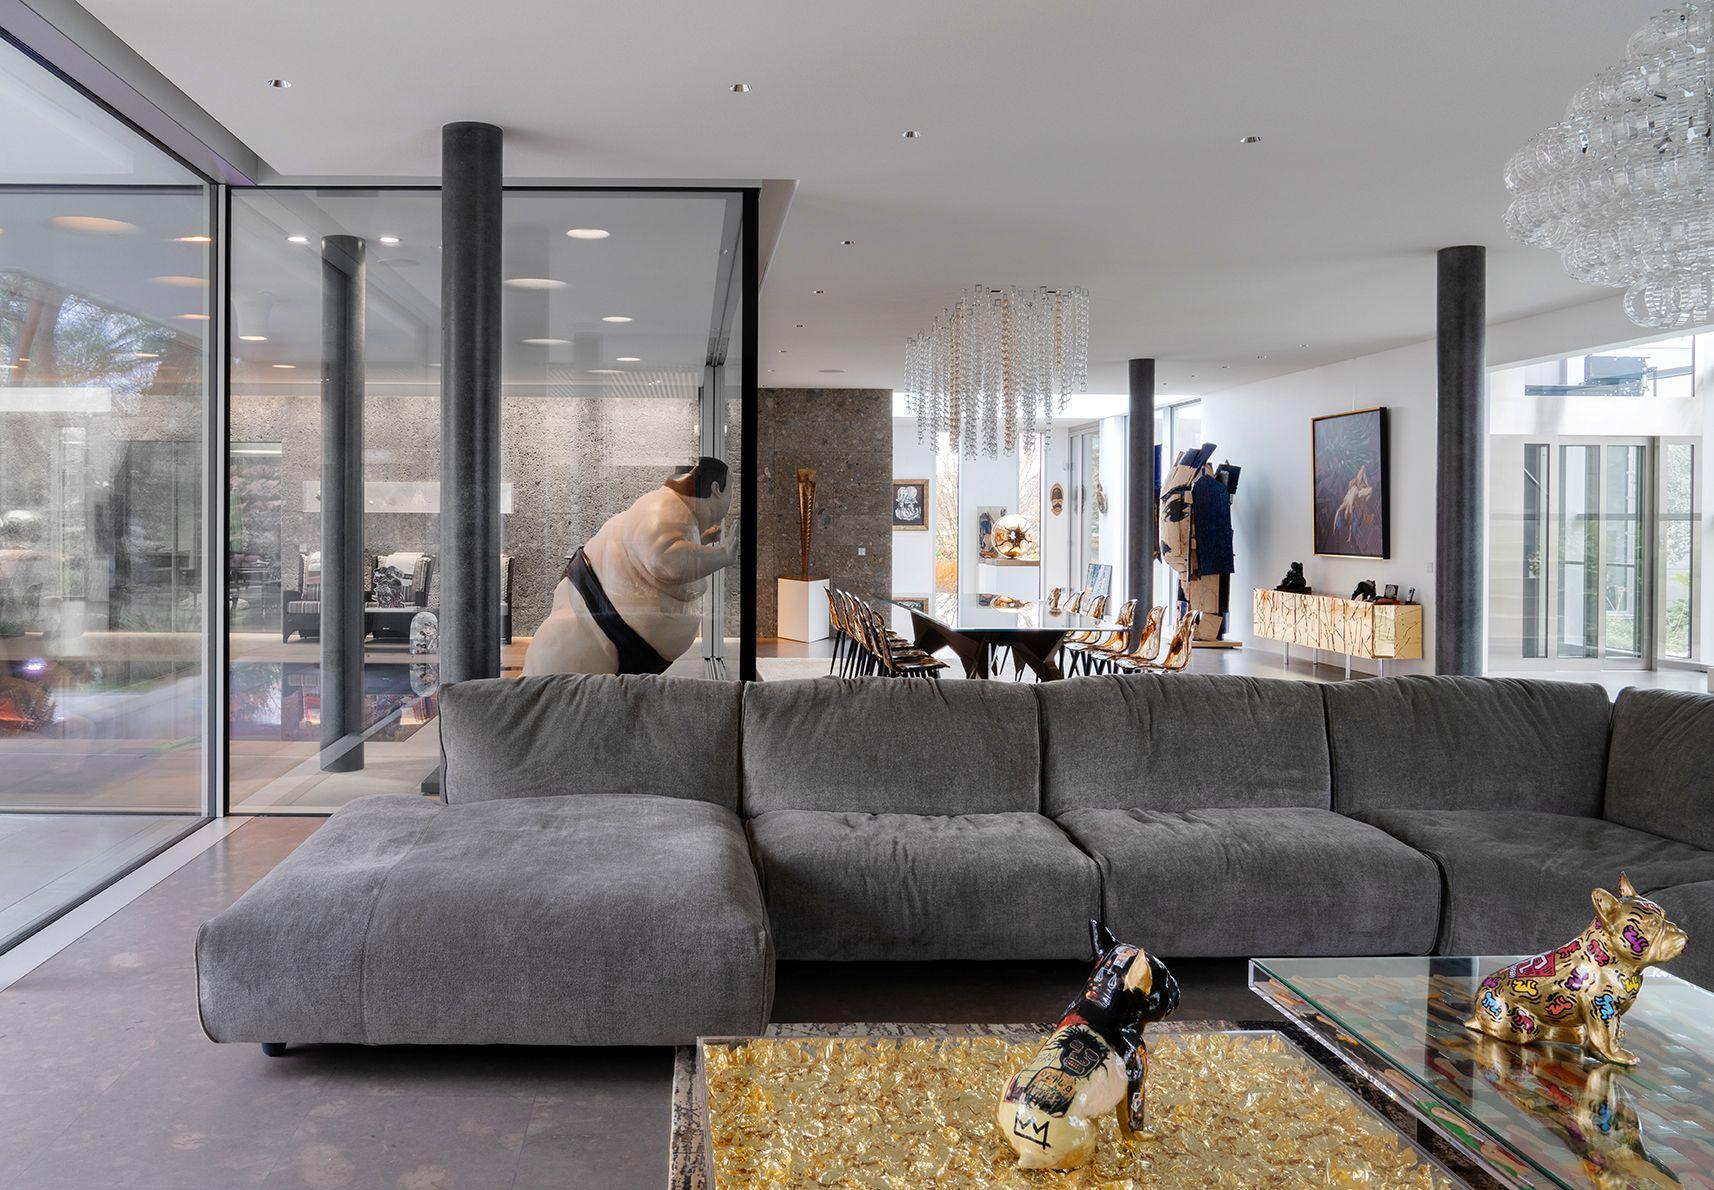 Villa in Svizzera - image 5